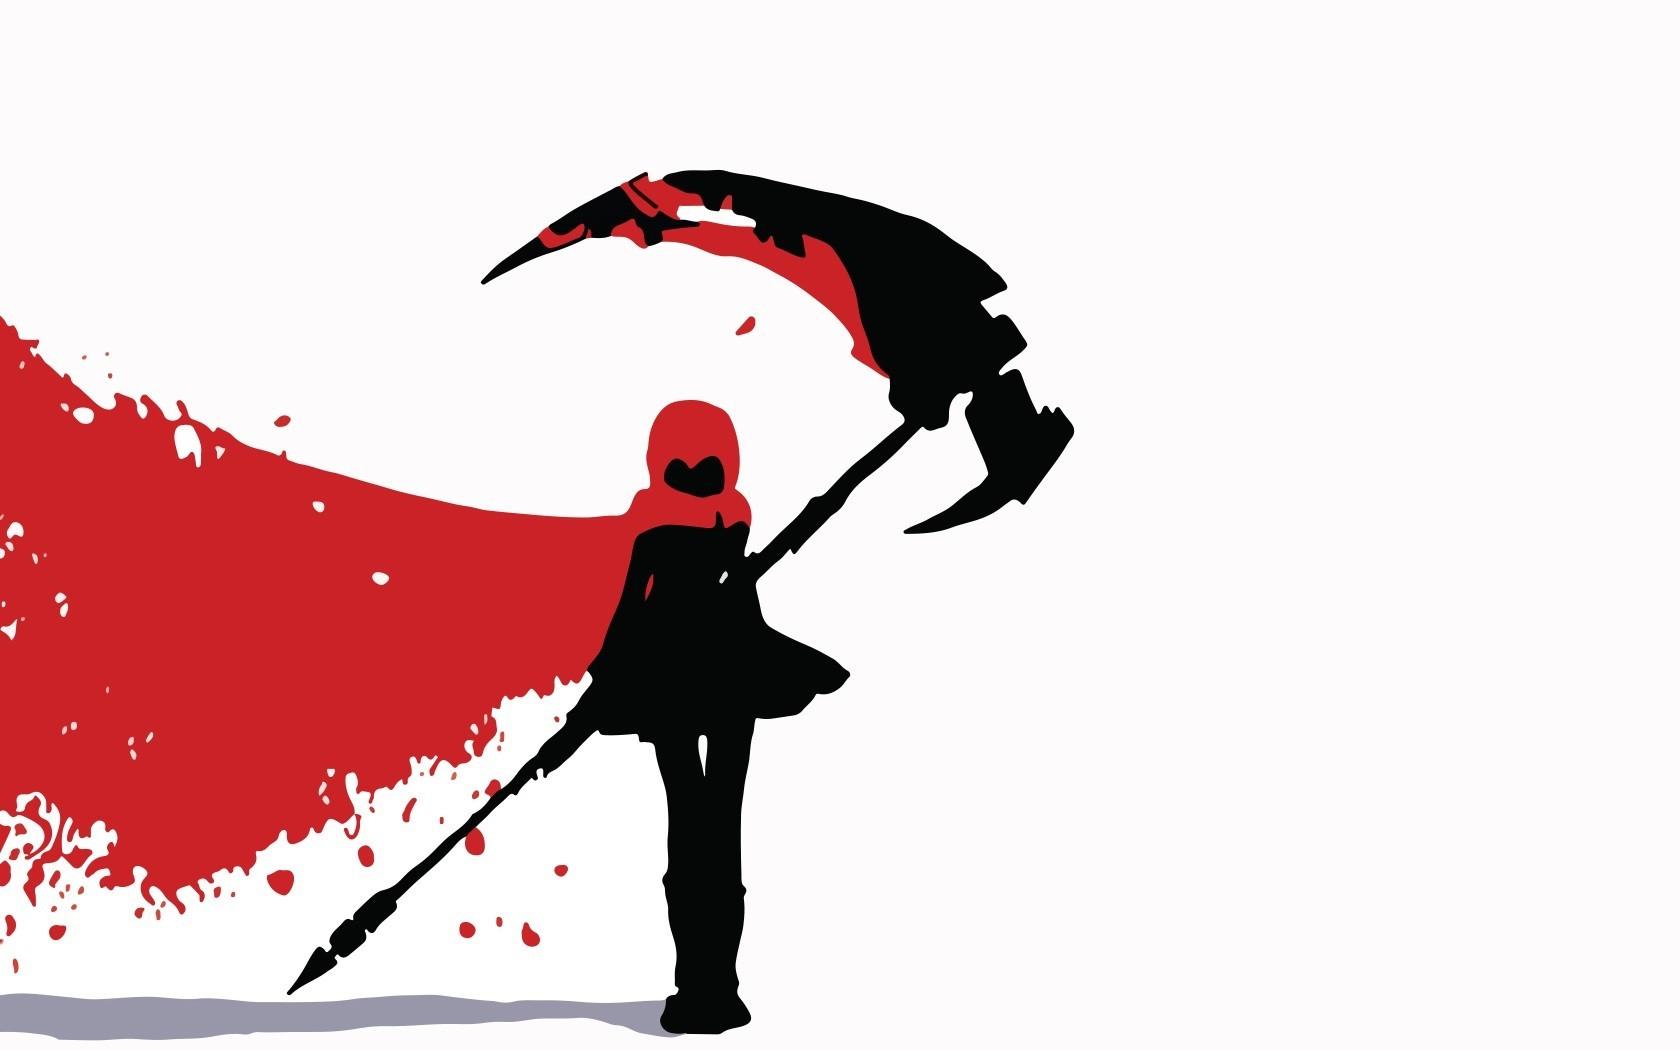 Illustration Silhouette Cartoon RWBY Rooster Teeth Ruby Rose Bird 1680x1050 Px